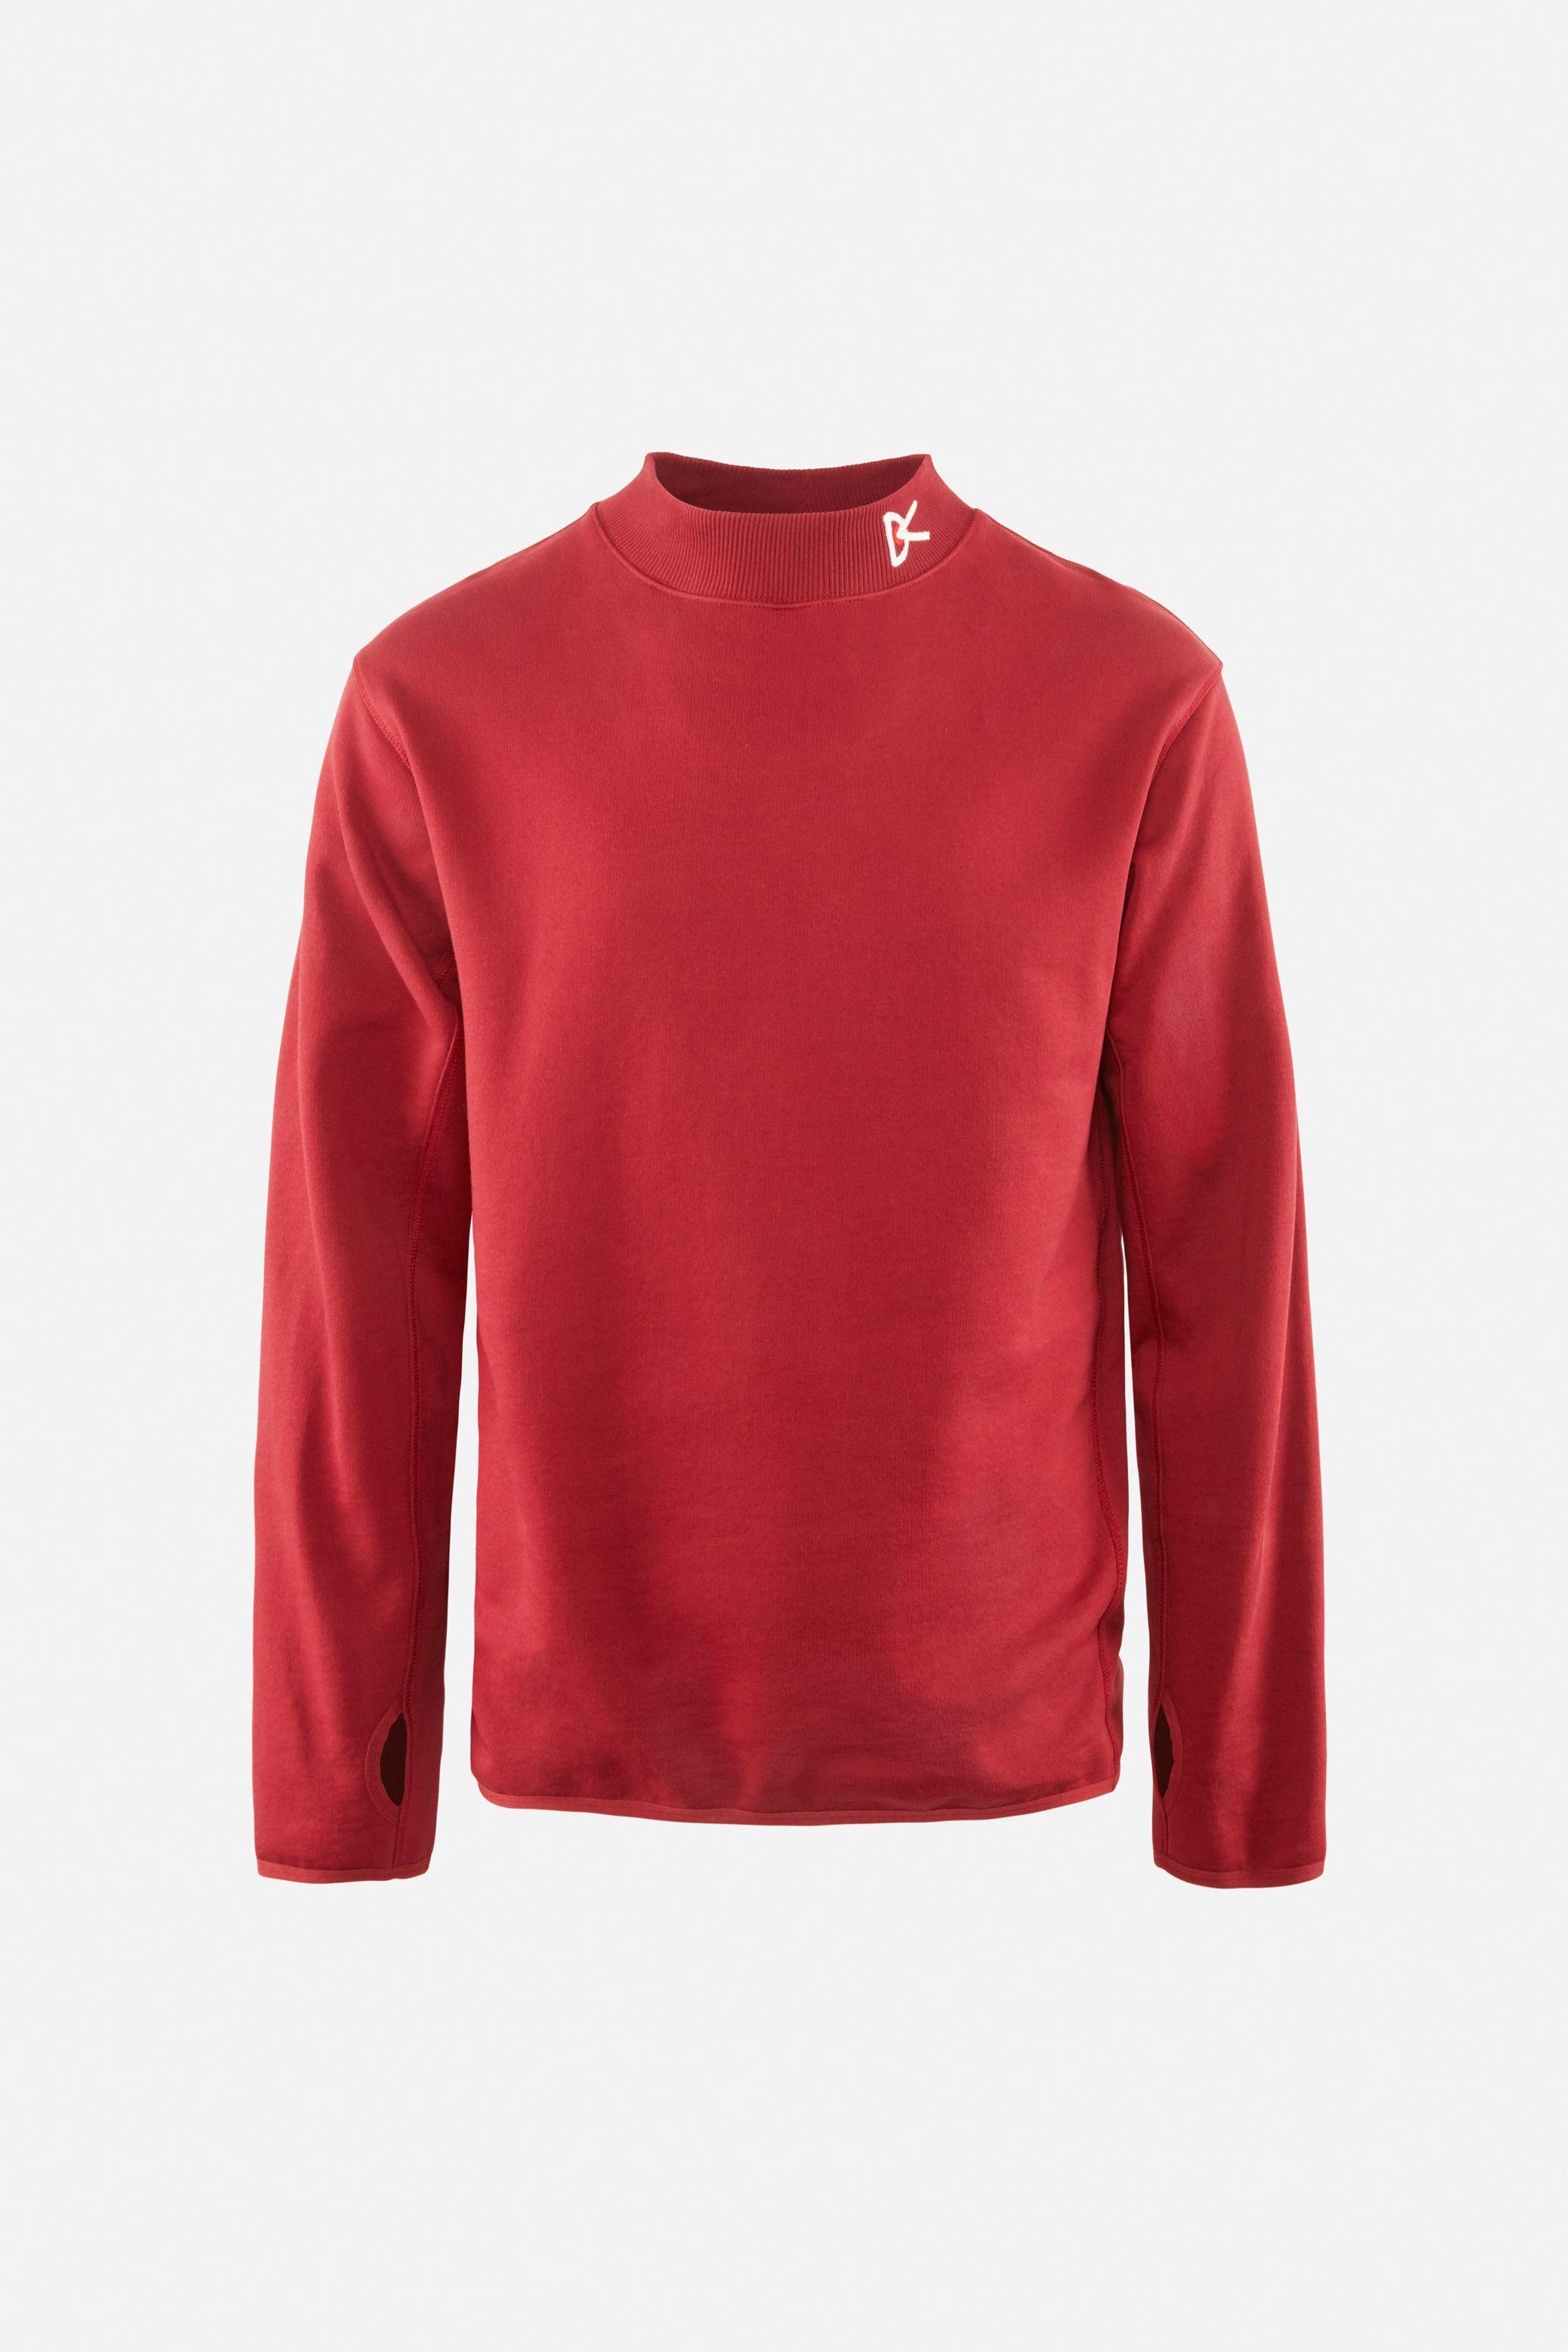 Hiei Mock Neck Sweatshirt, Burgundy